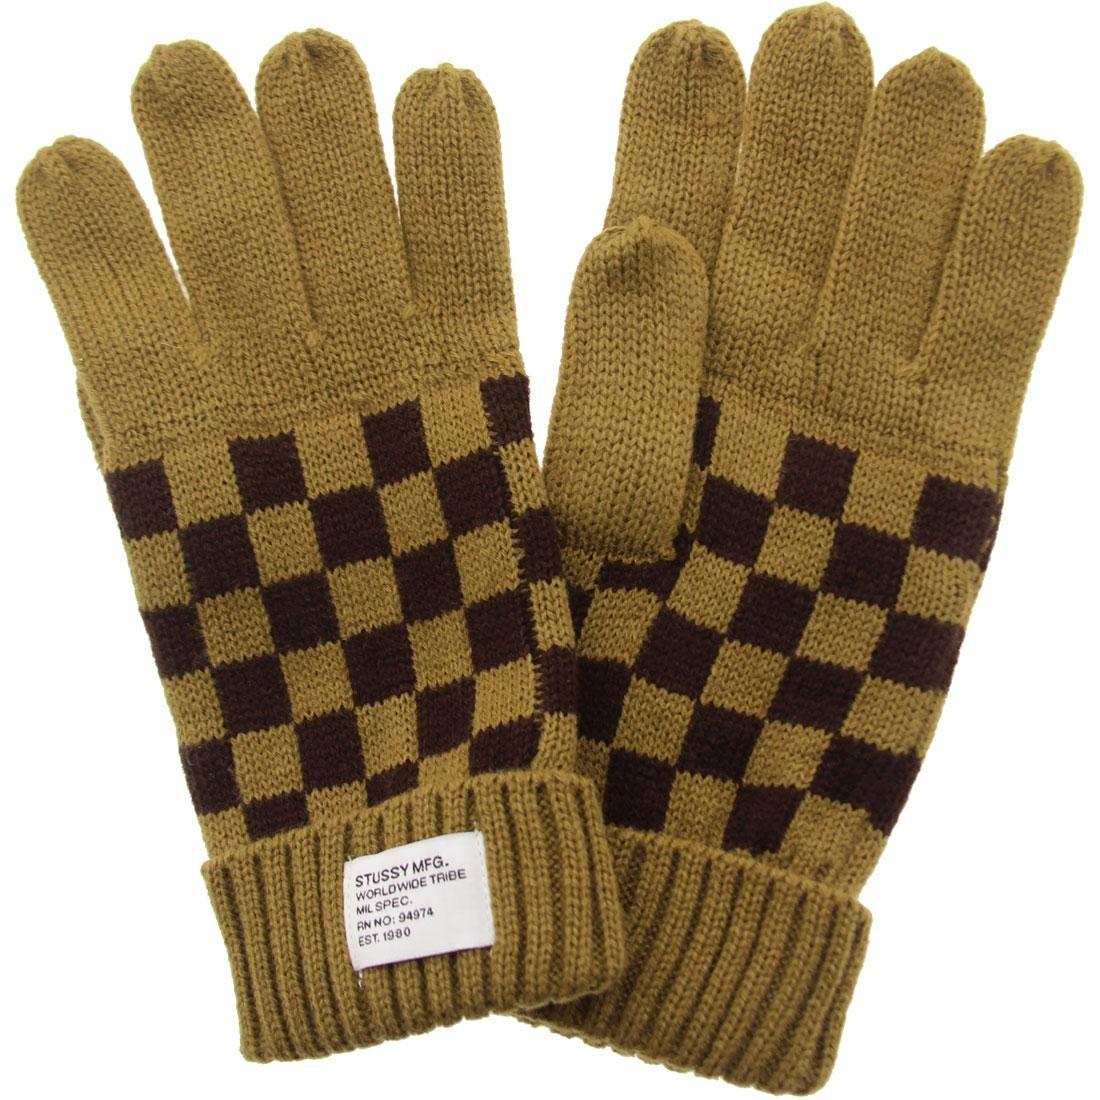 Stussy Checkerboard Gloves (brown)